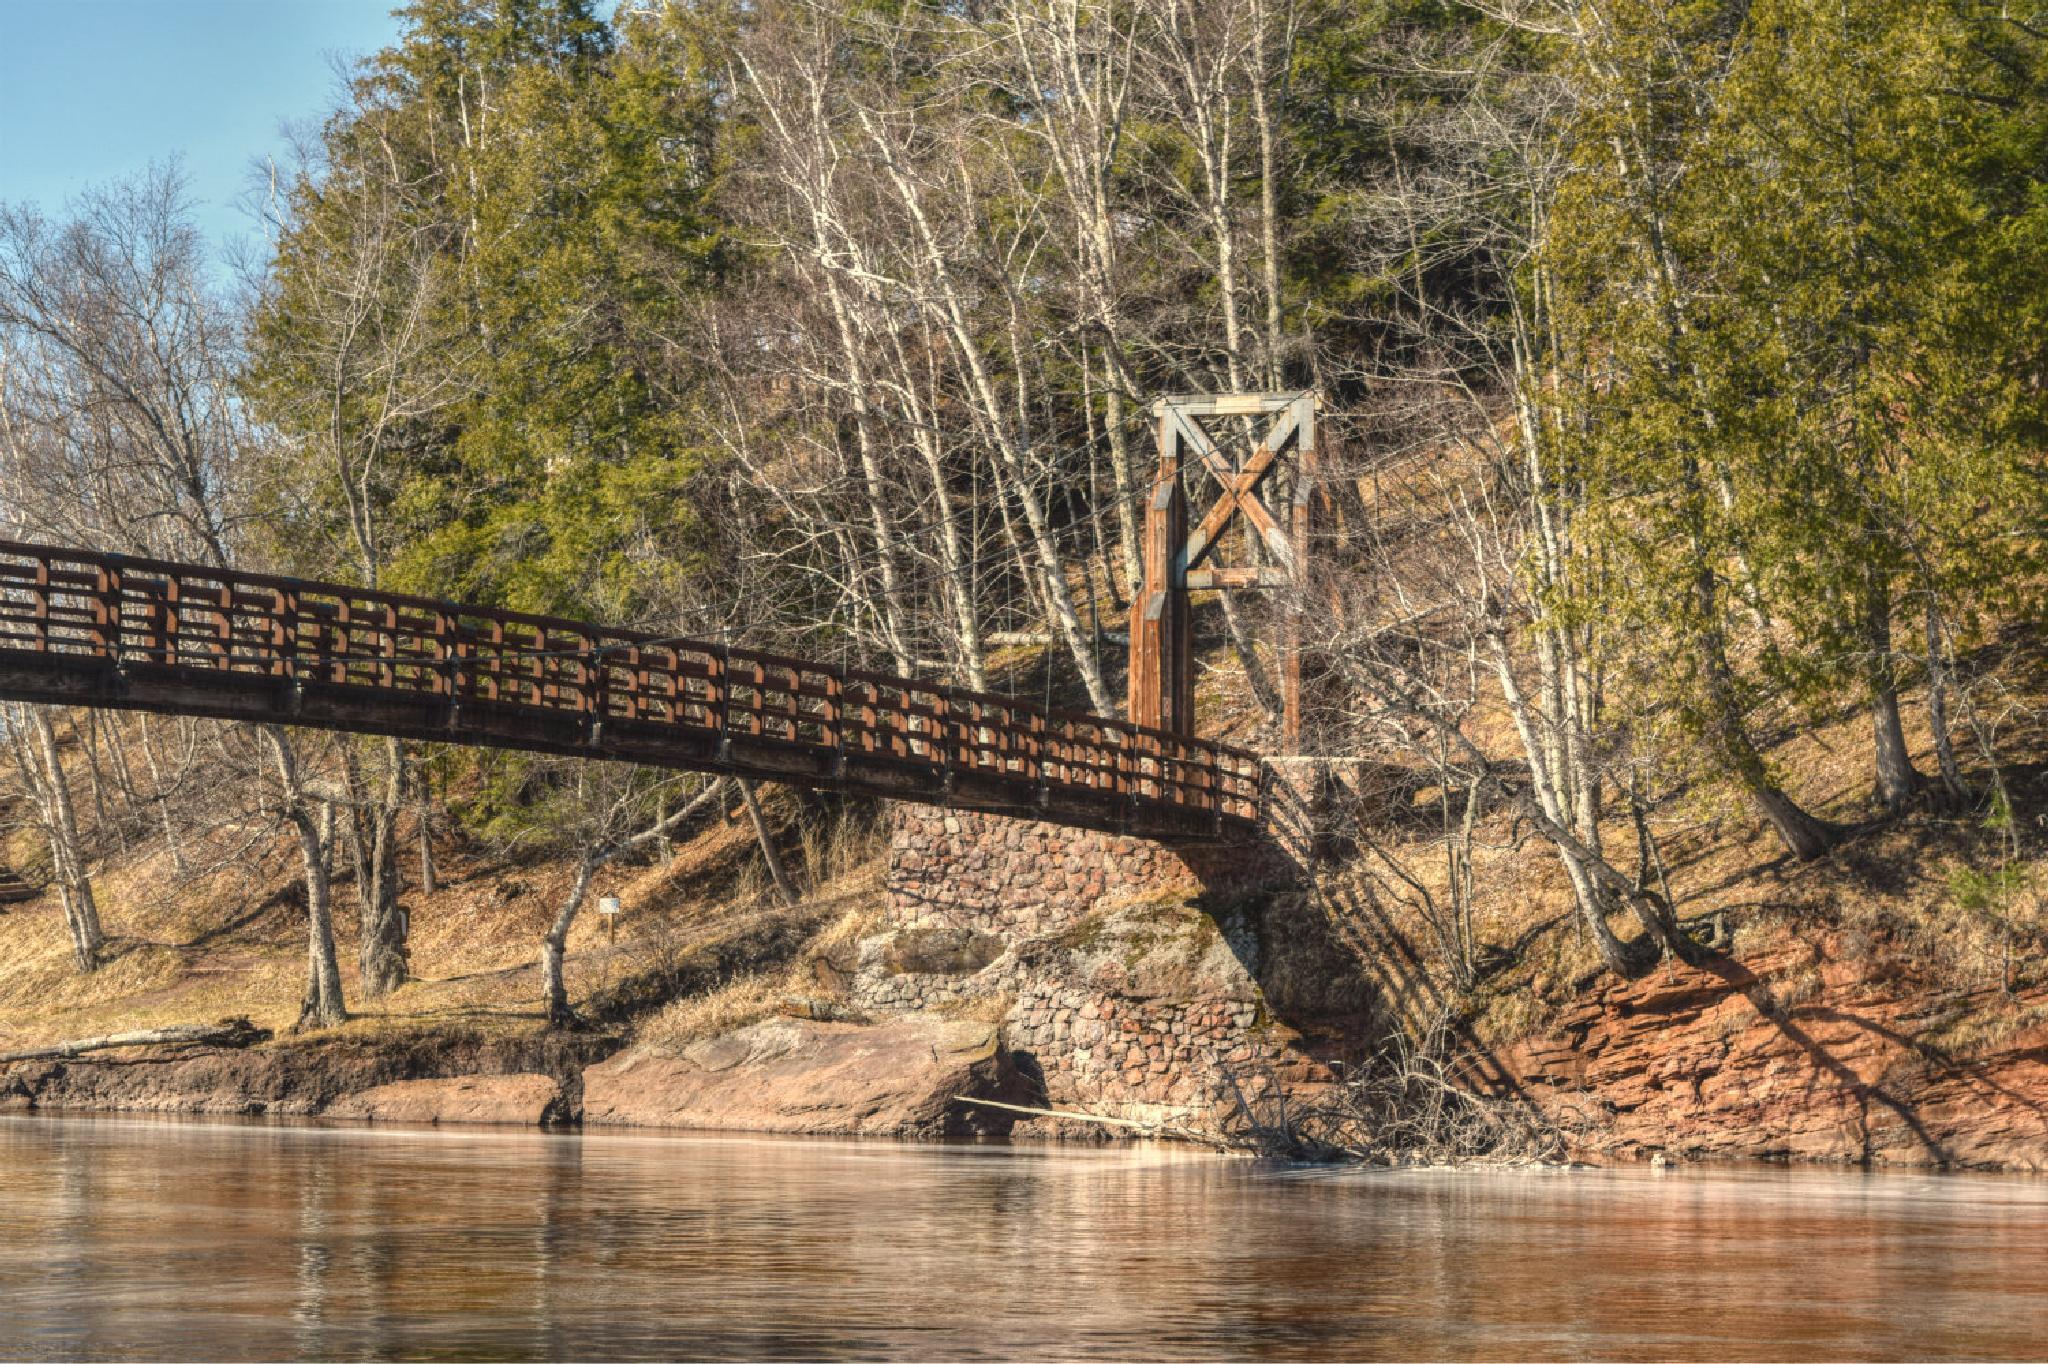 Black River Harbor Bridge by Nichole Petranek